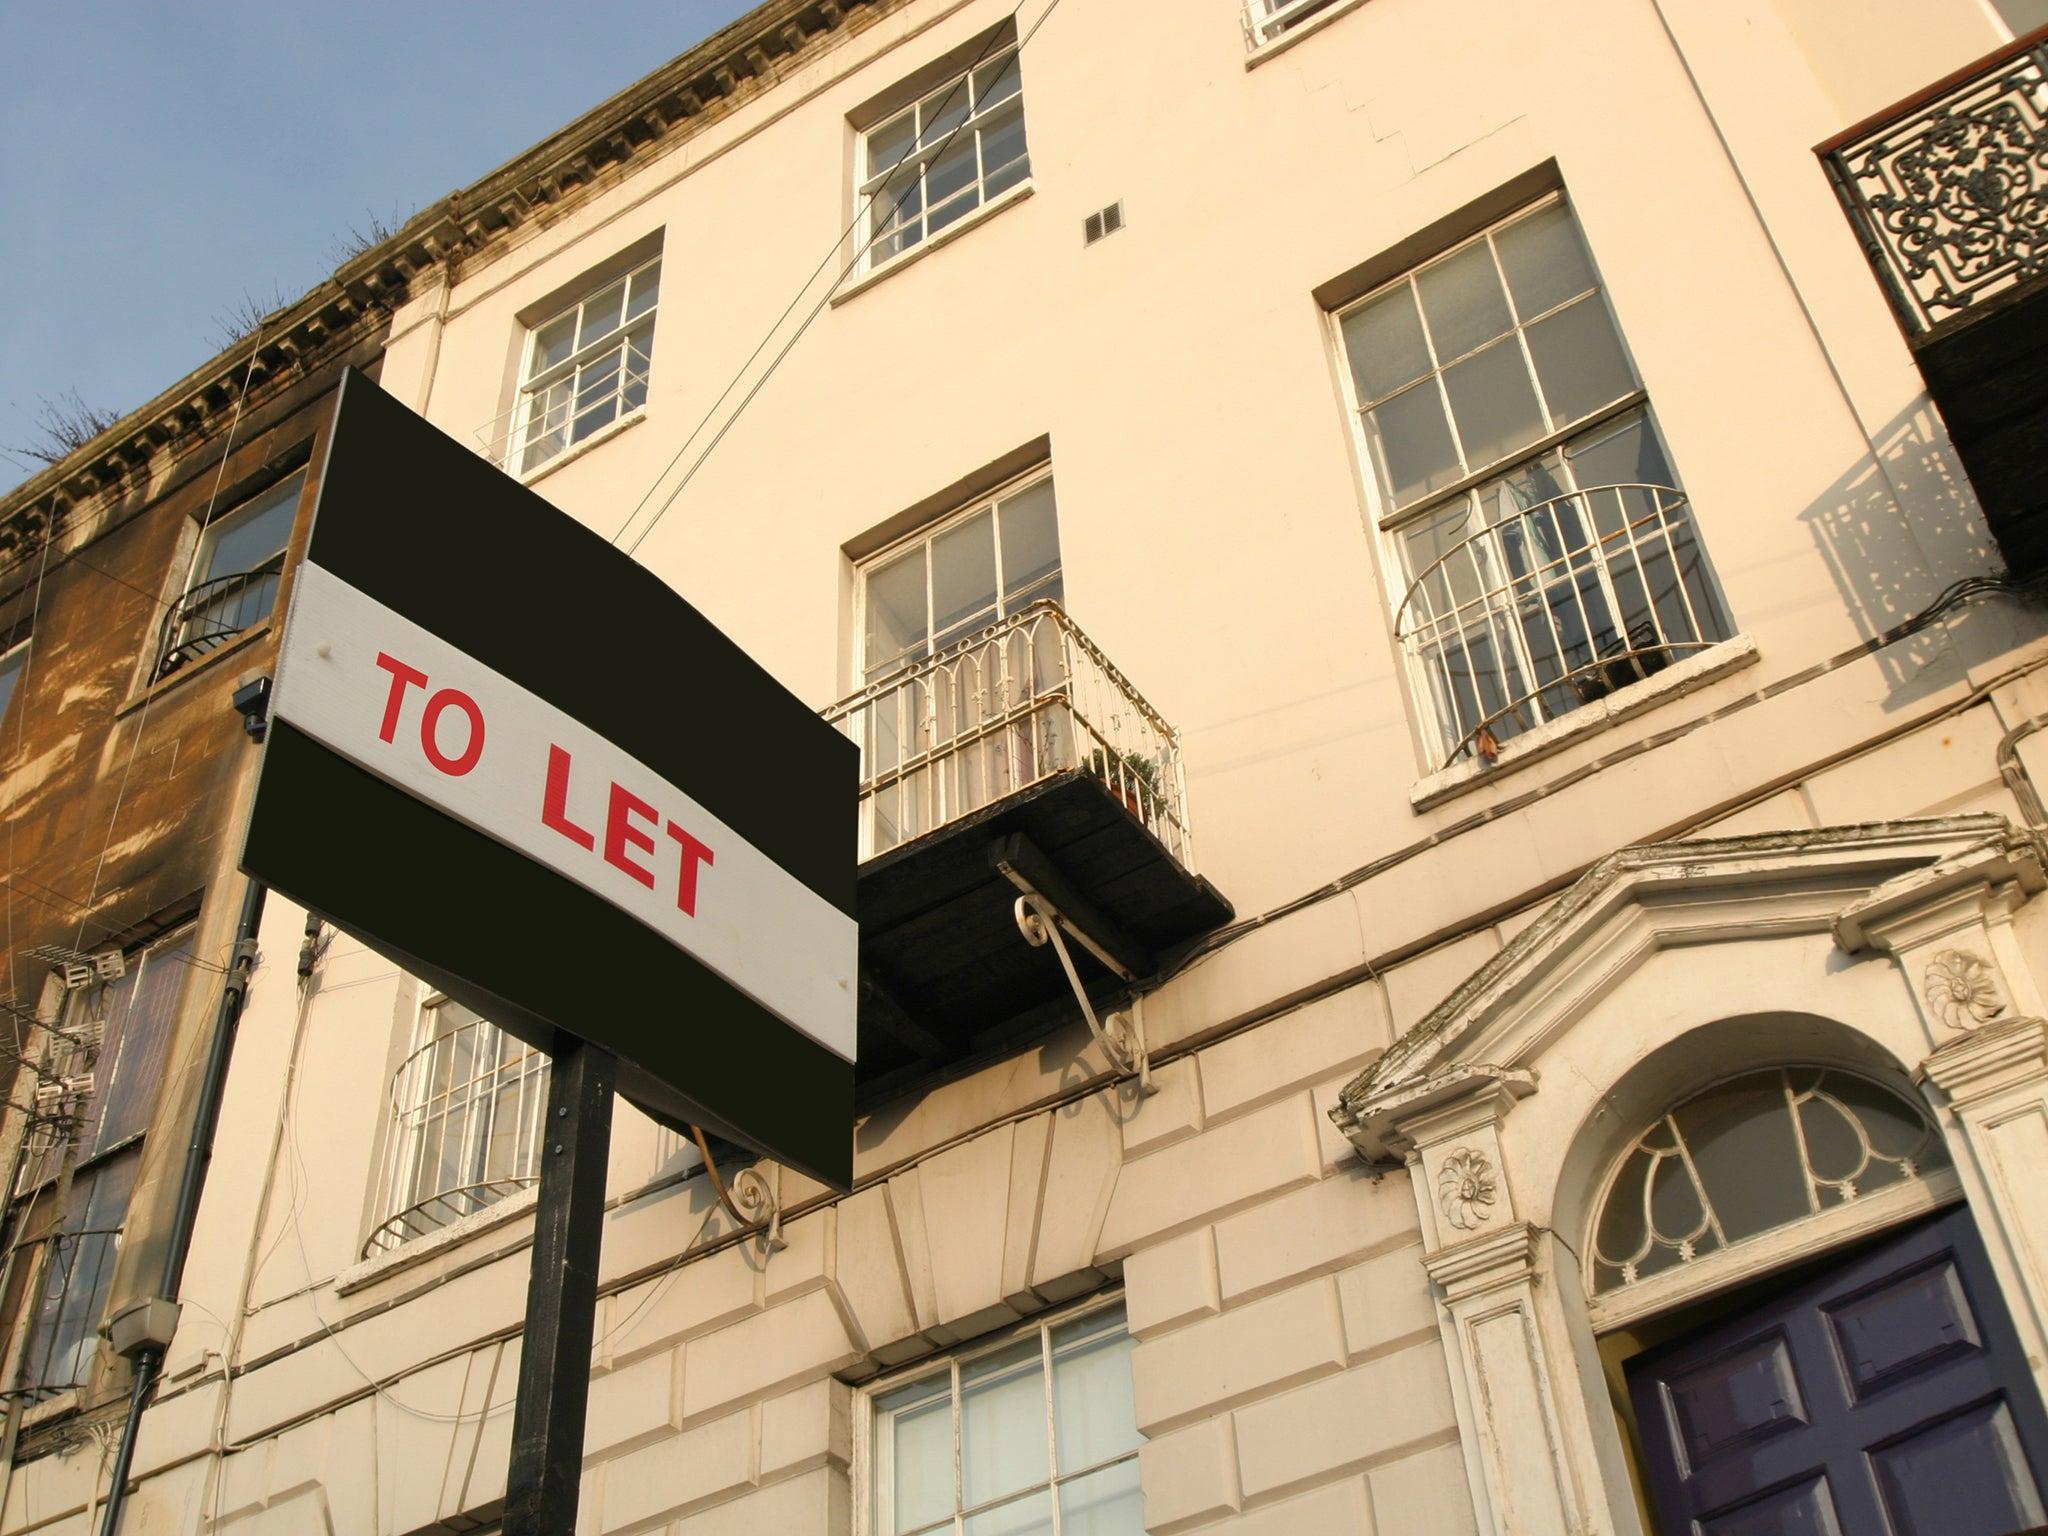 Landlords 'risking lives of tenants